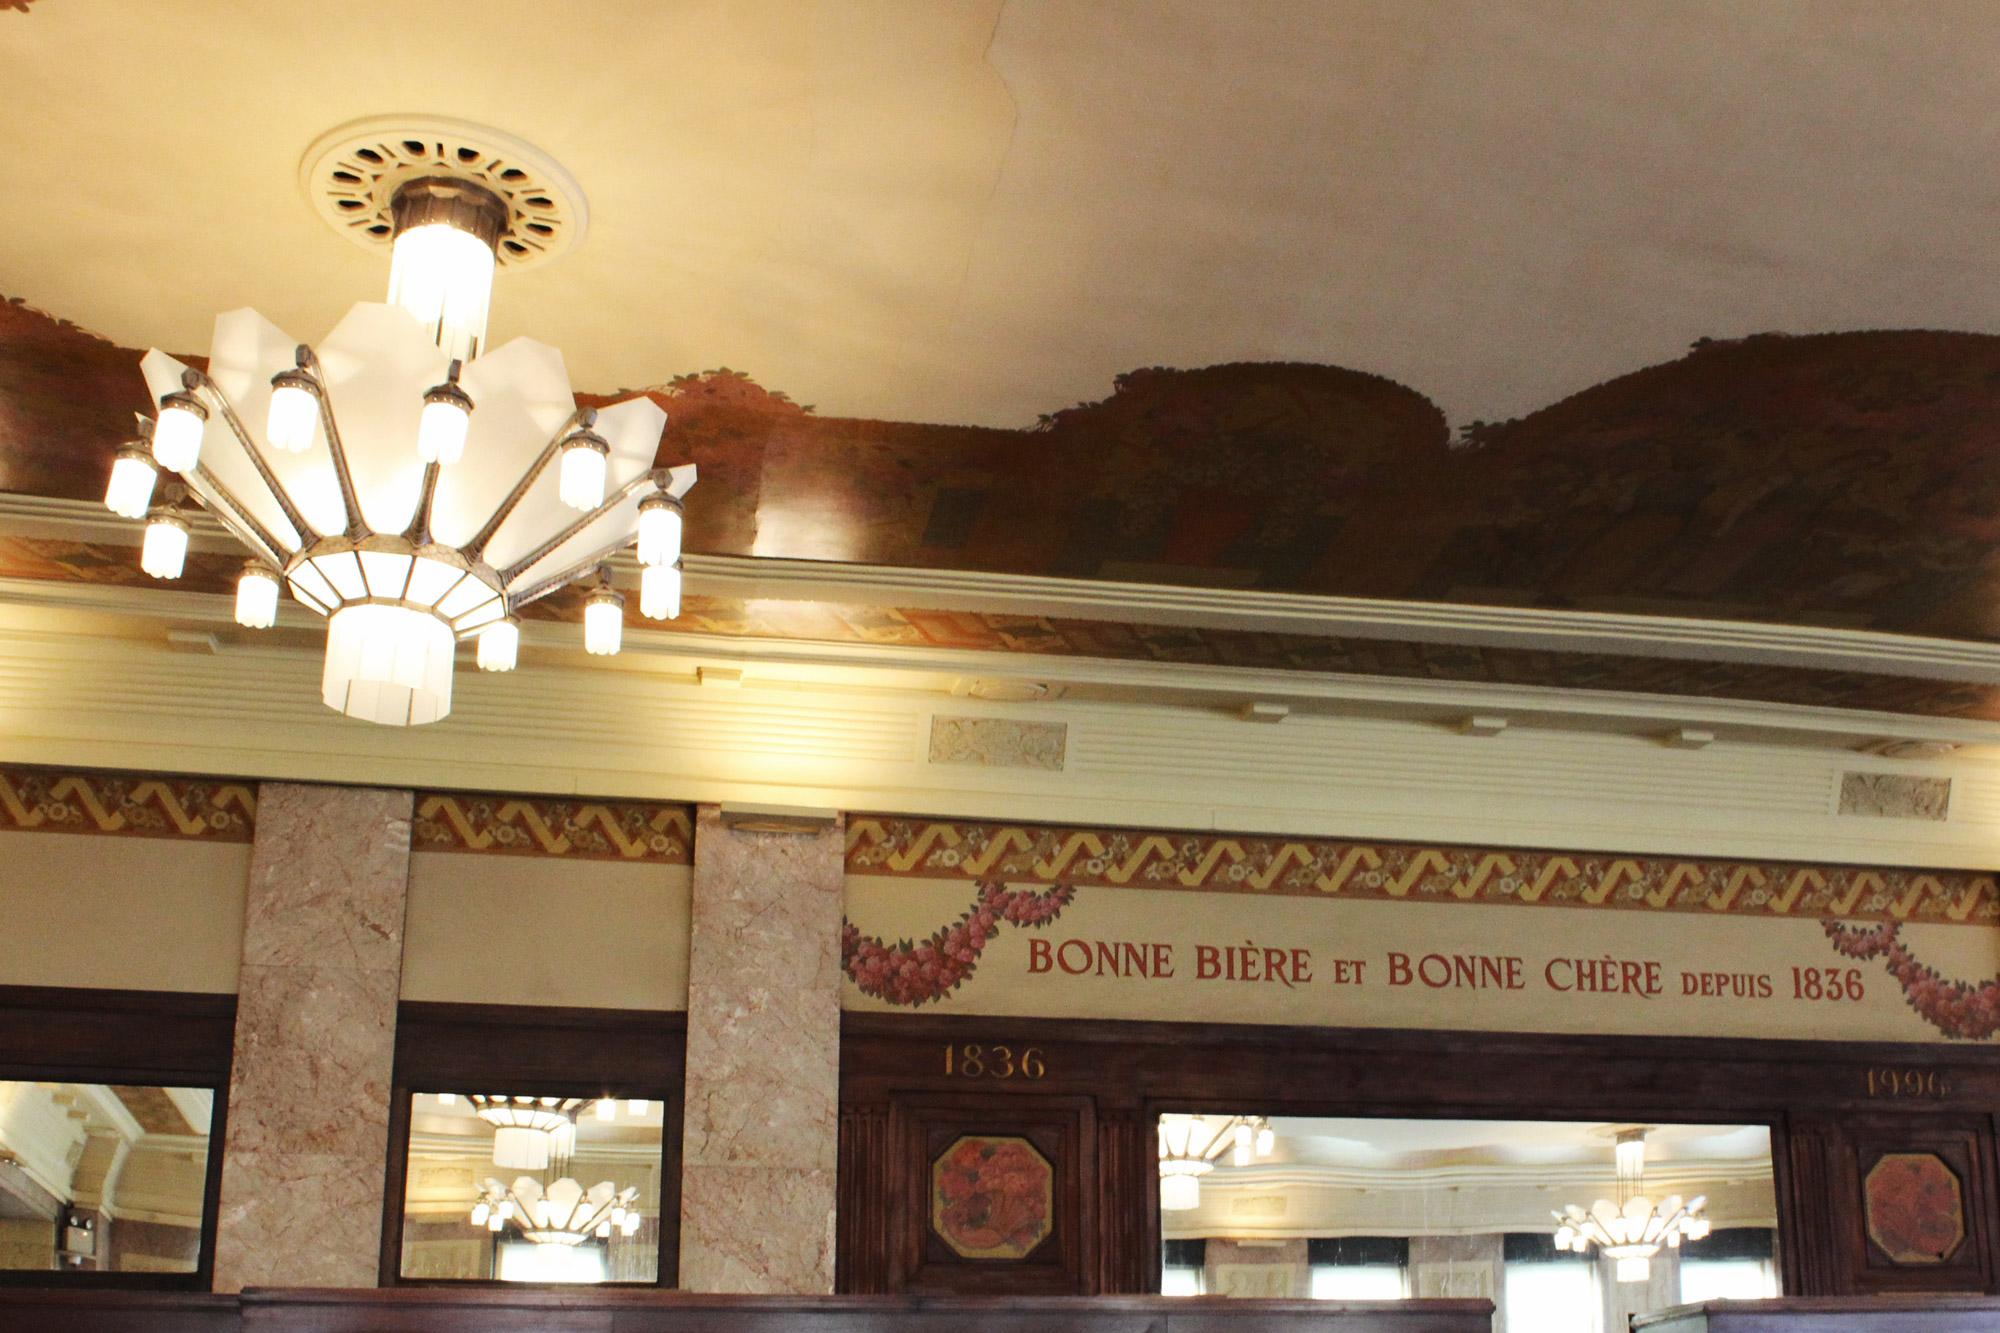 brasserie-georges-1836-bonne-biere-bonne-chere